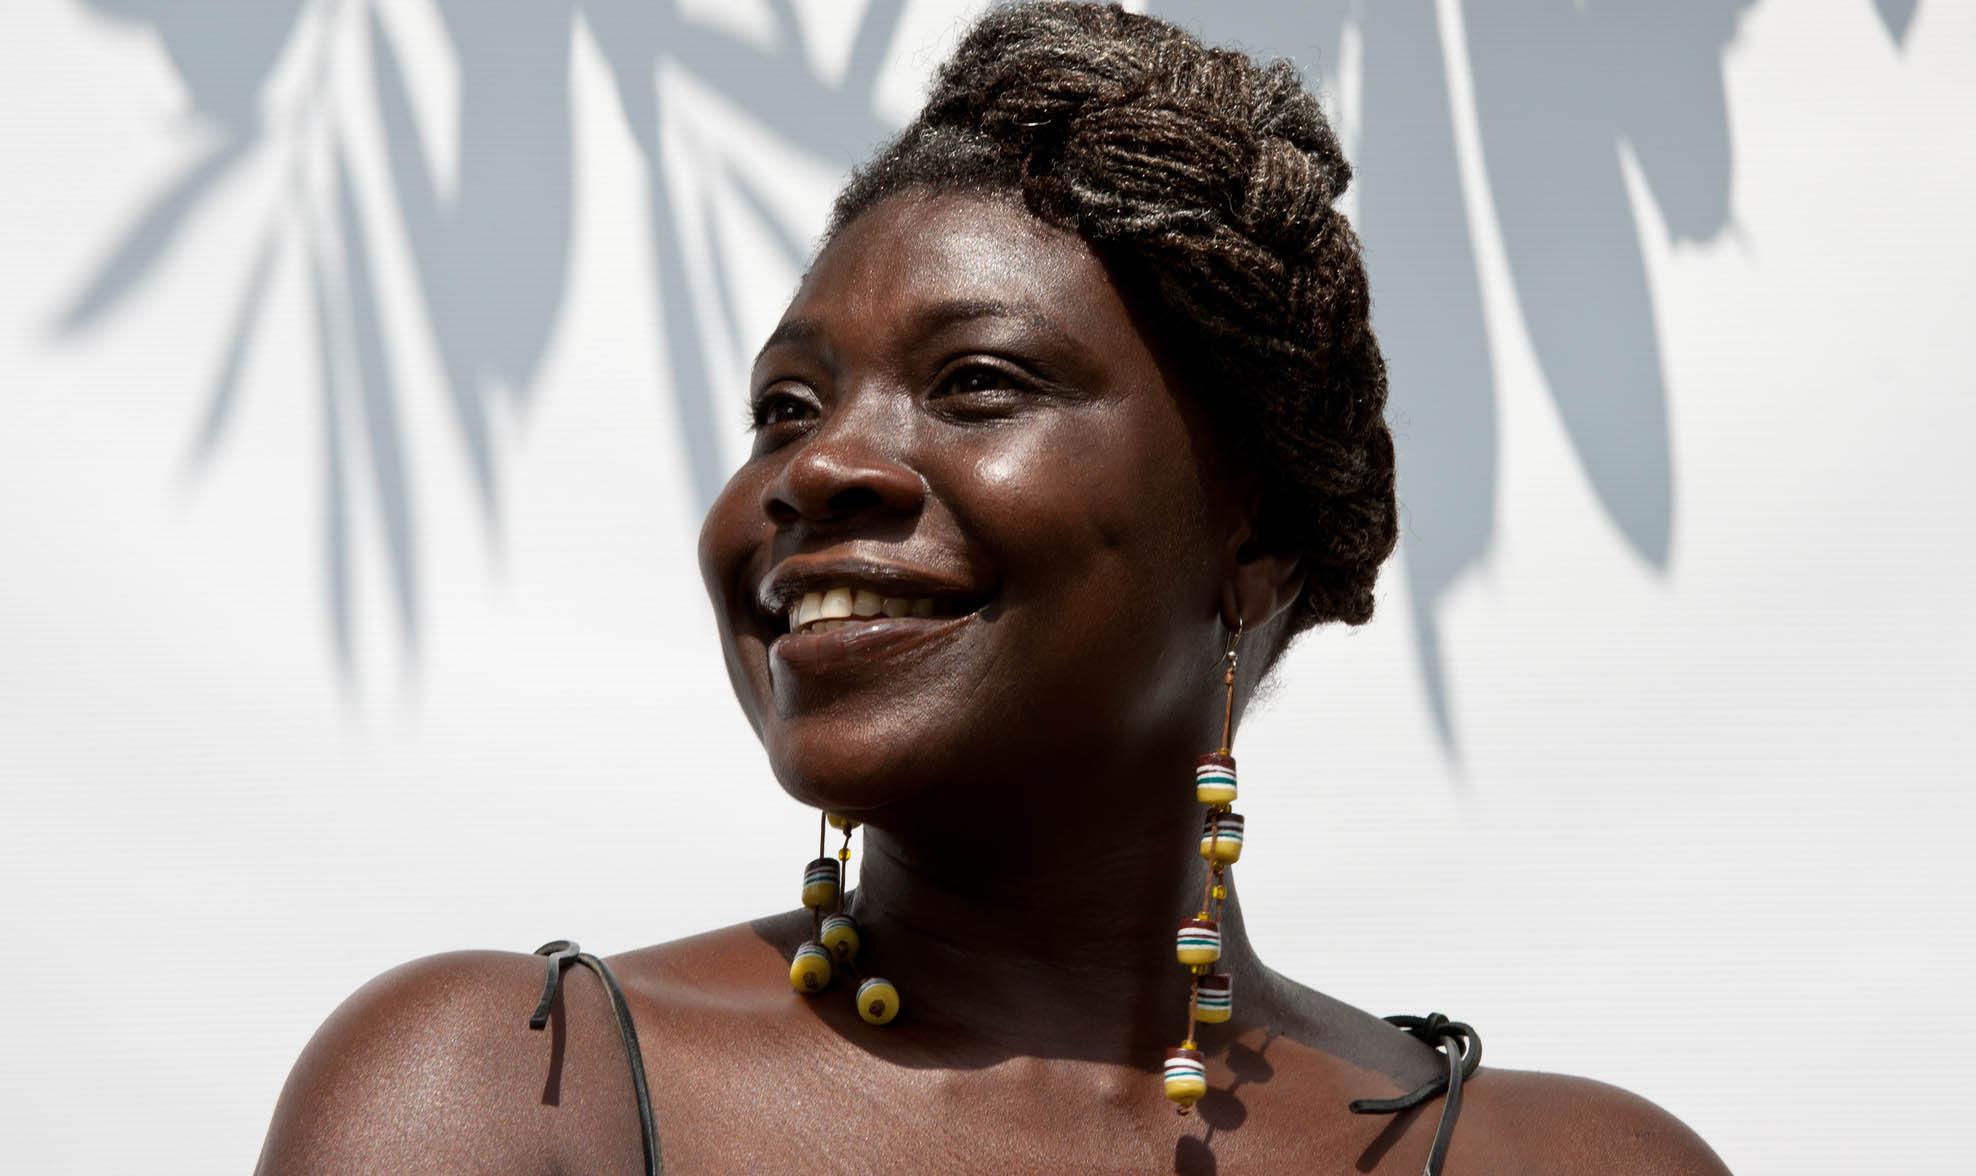 Spending My Youthful Years In Ghana Was A Waste - Akua Djanie-Manfoe. 3